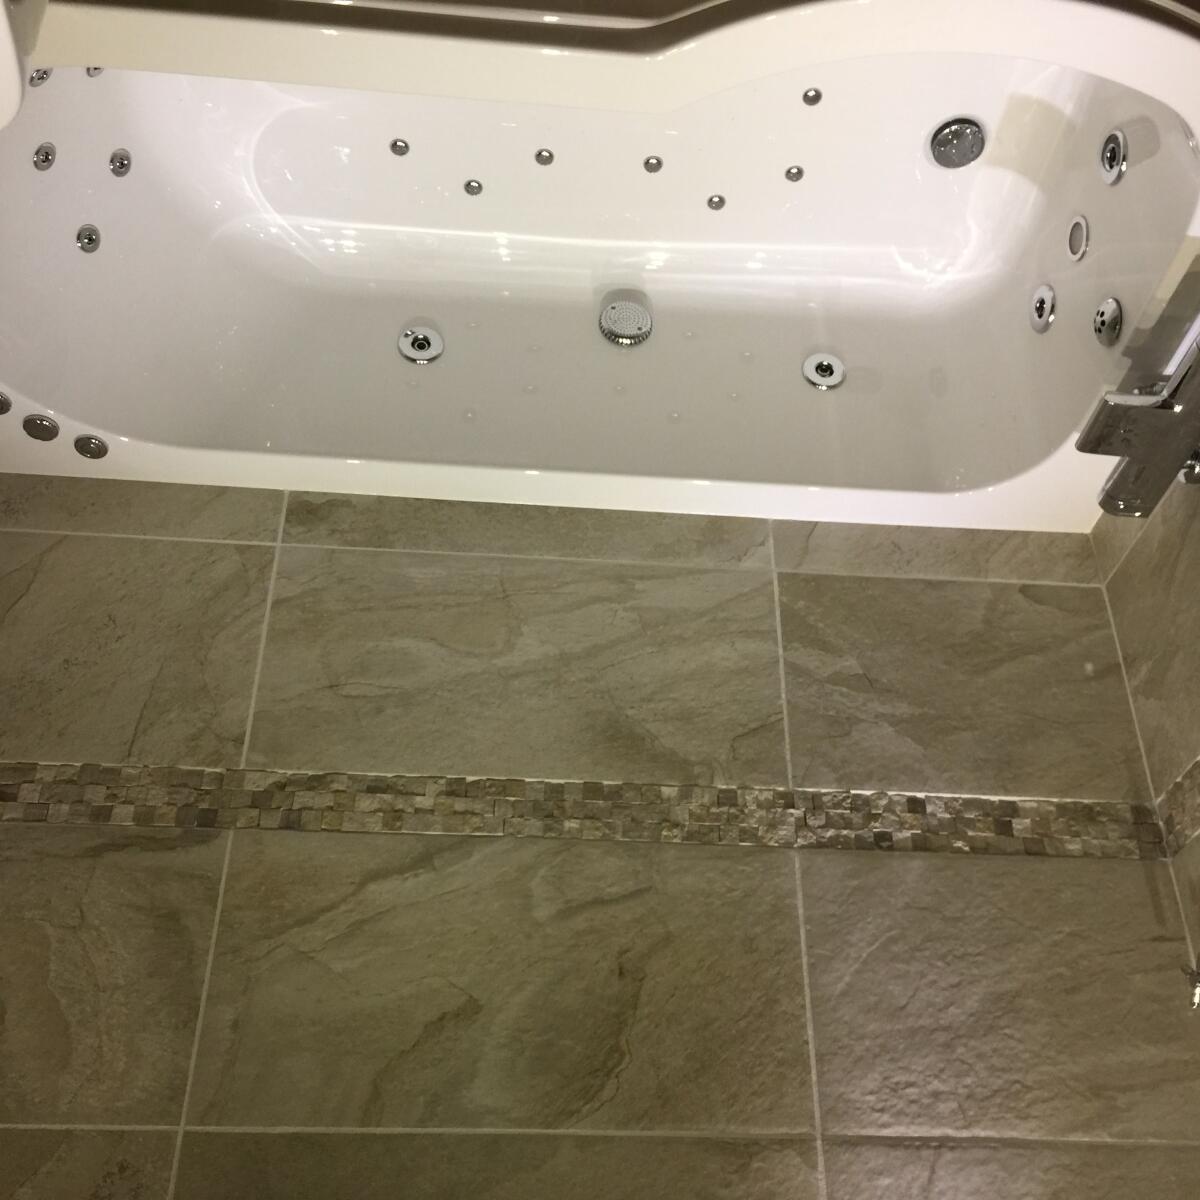 The Whirlpool Bath Shop Reviews - Read 562 Genuine Customer Reviews ...